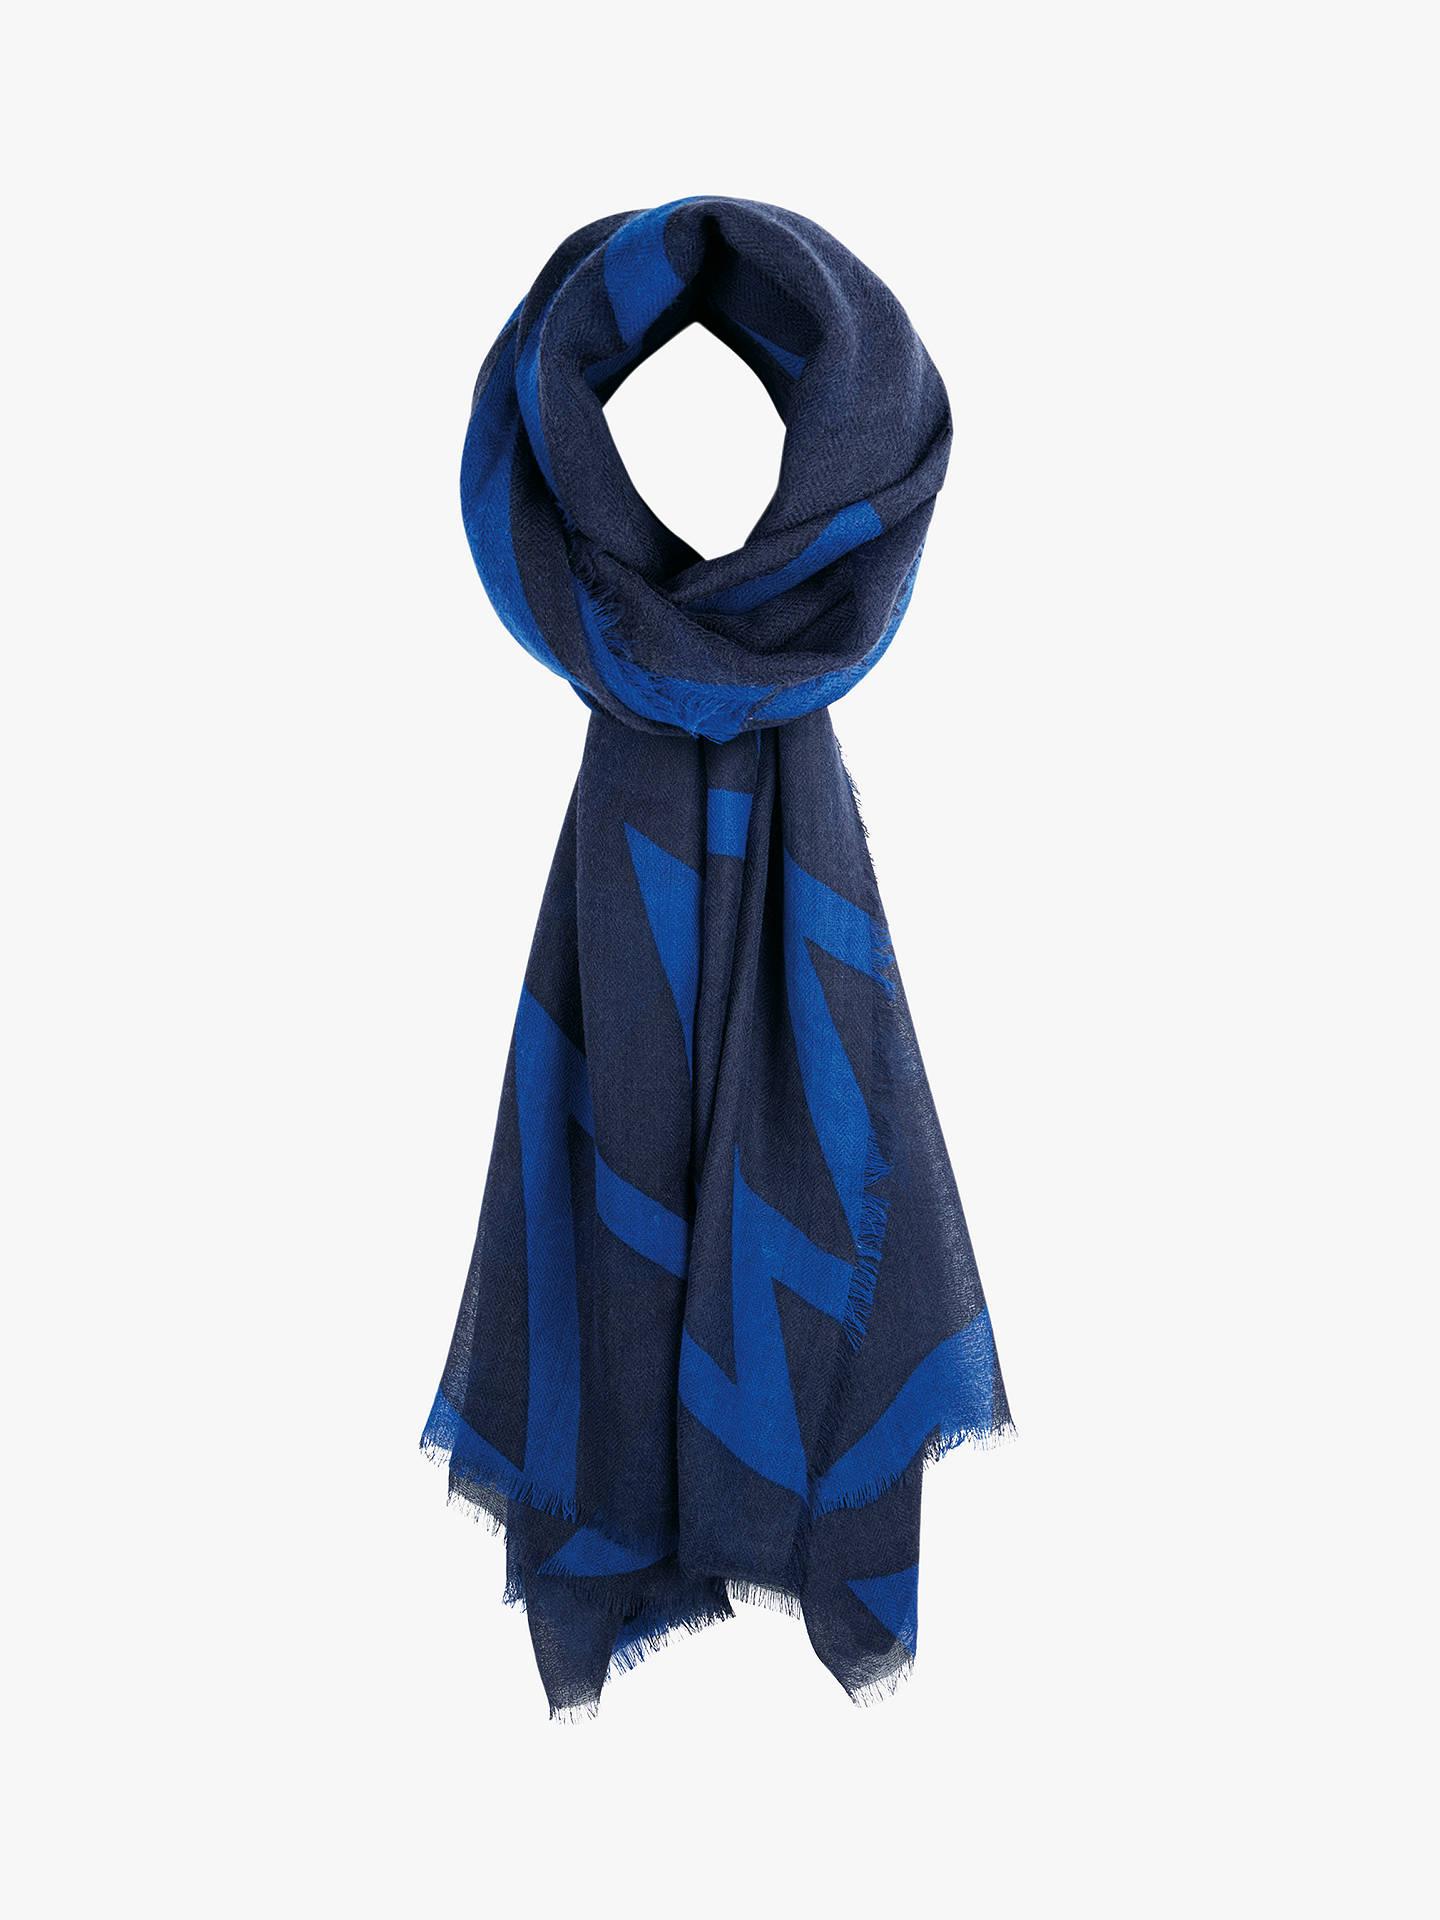 ac7adb010 Buy hush Zig Zag Wool Scarf, Blue/Navy Online at johnlewis.com ...